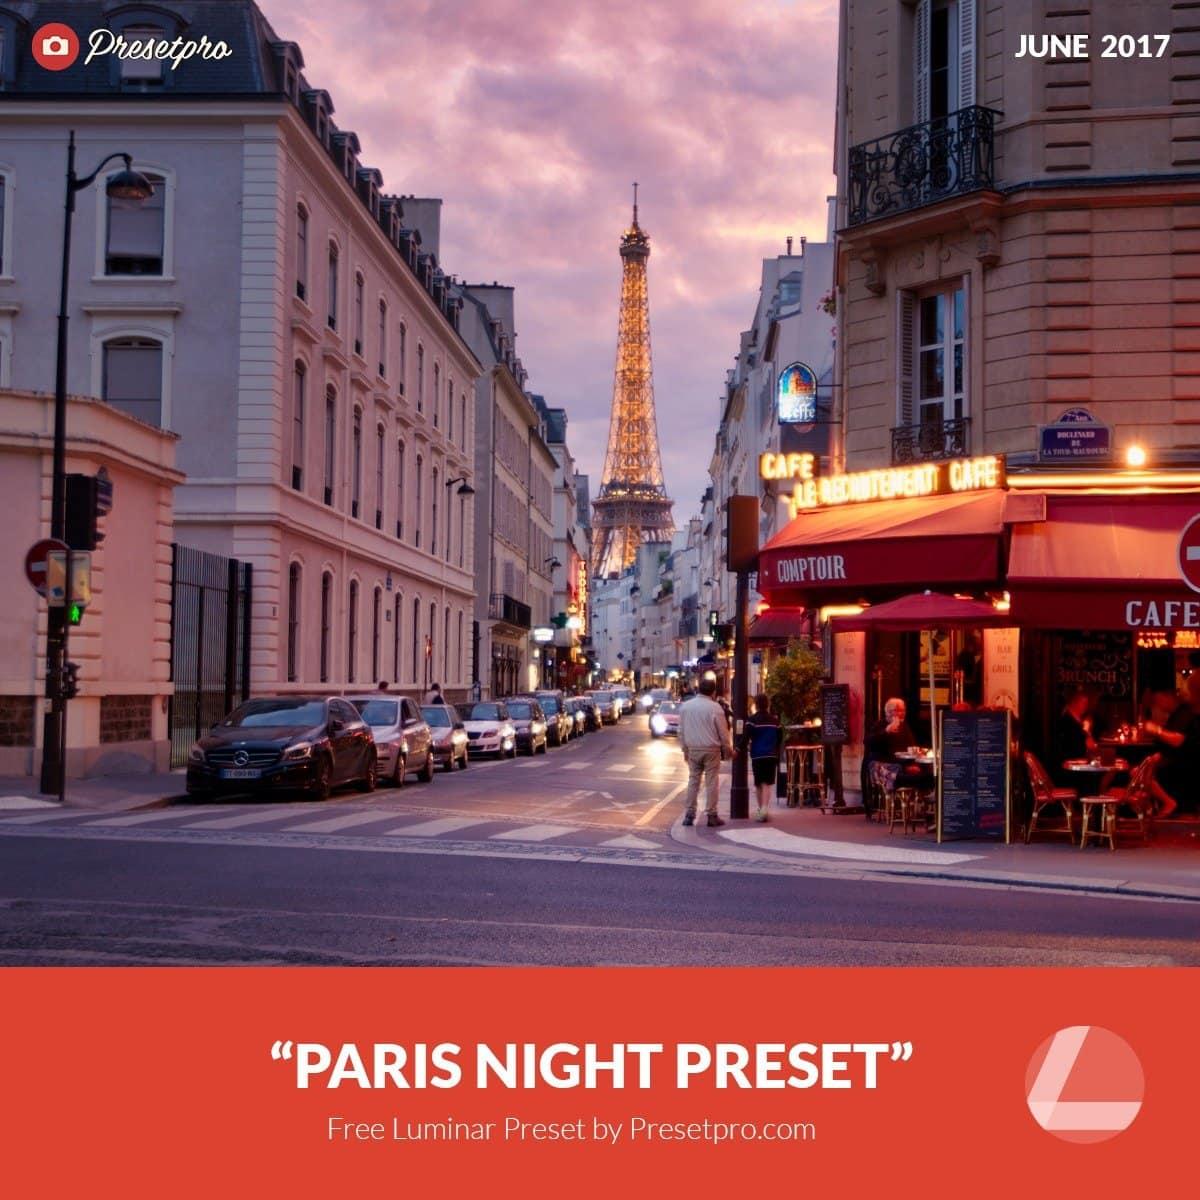 Free-Luminar-Preset-Paris-Night-Presetpro.com